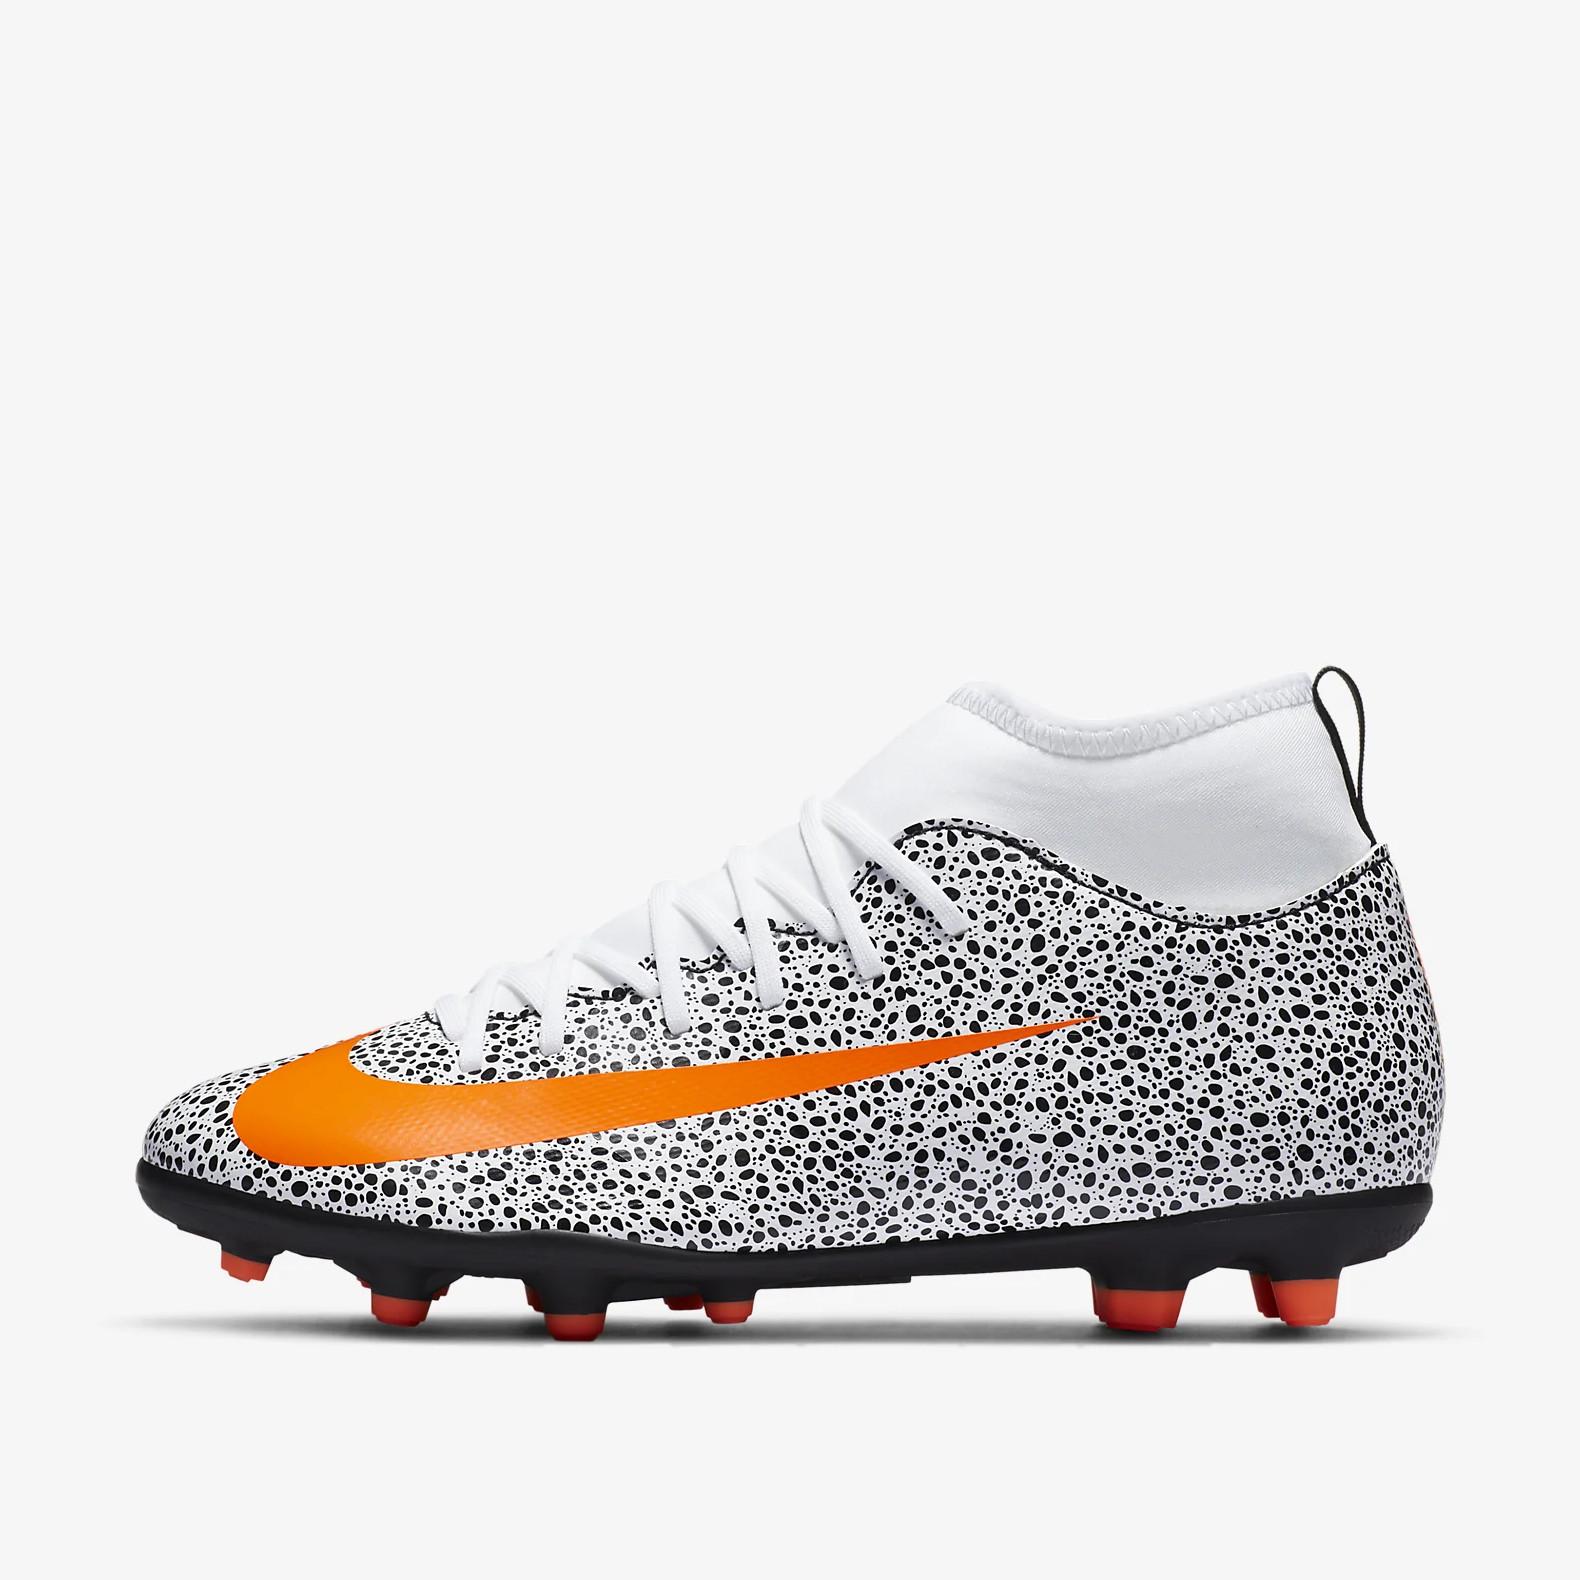 Nike Mercurial CR7 Ronaldo Voetbalschoenen Voetbal schoenen.eu